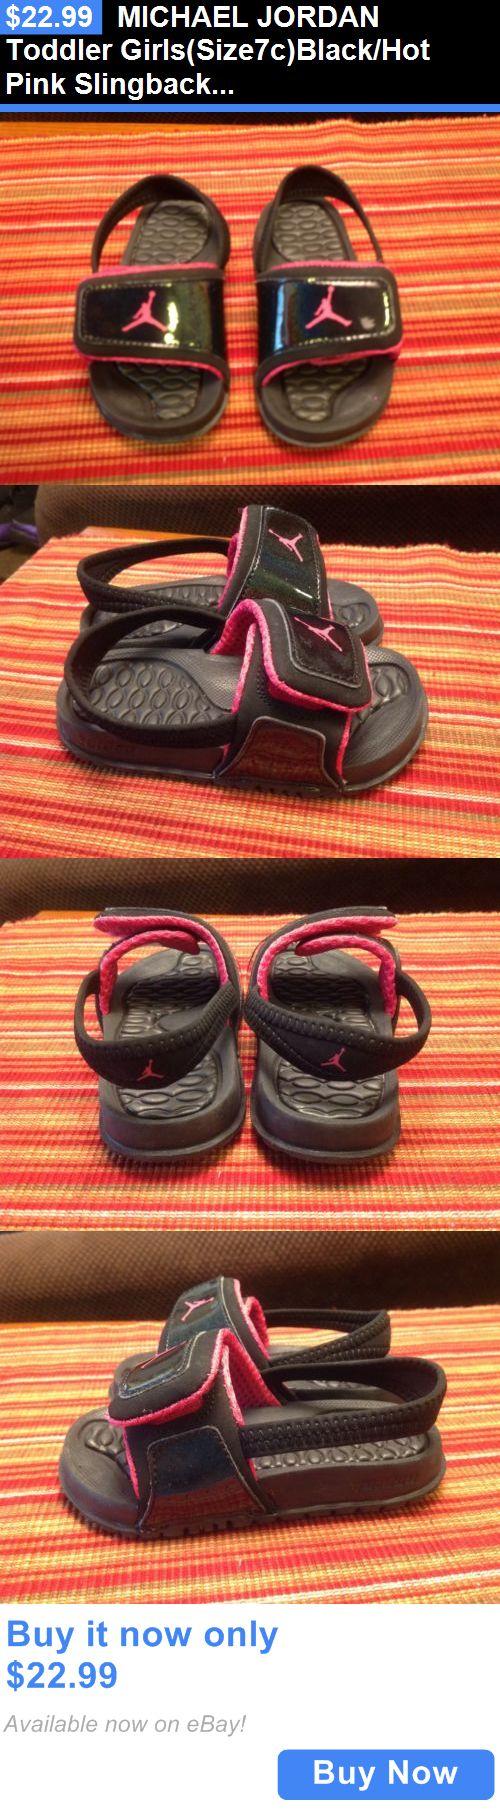 Michael Jordan Baby Clothing: Michael Jordan Toddler Girls(Size7c)Black/Hot Pink Slingback/Velcro Sandalseuc BUY IT NOW ONLY: $22.99